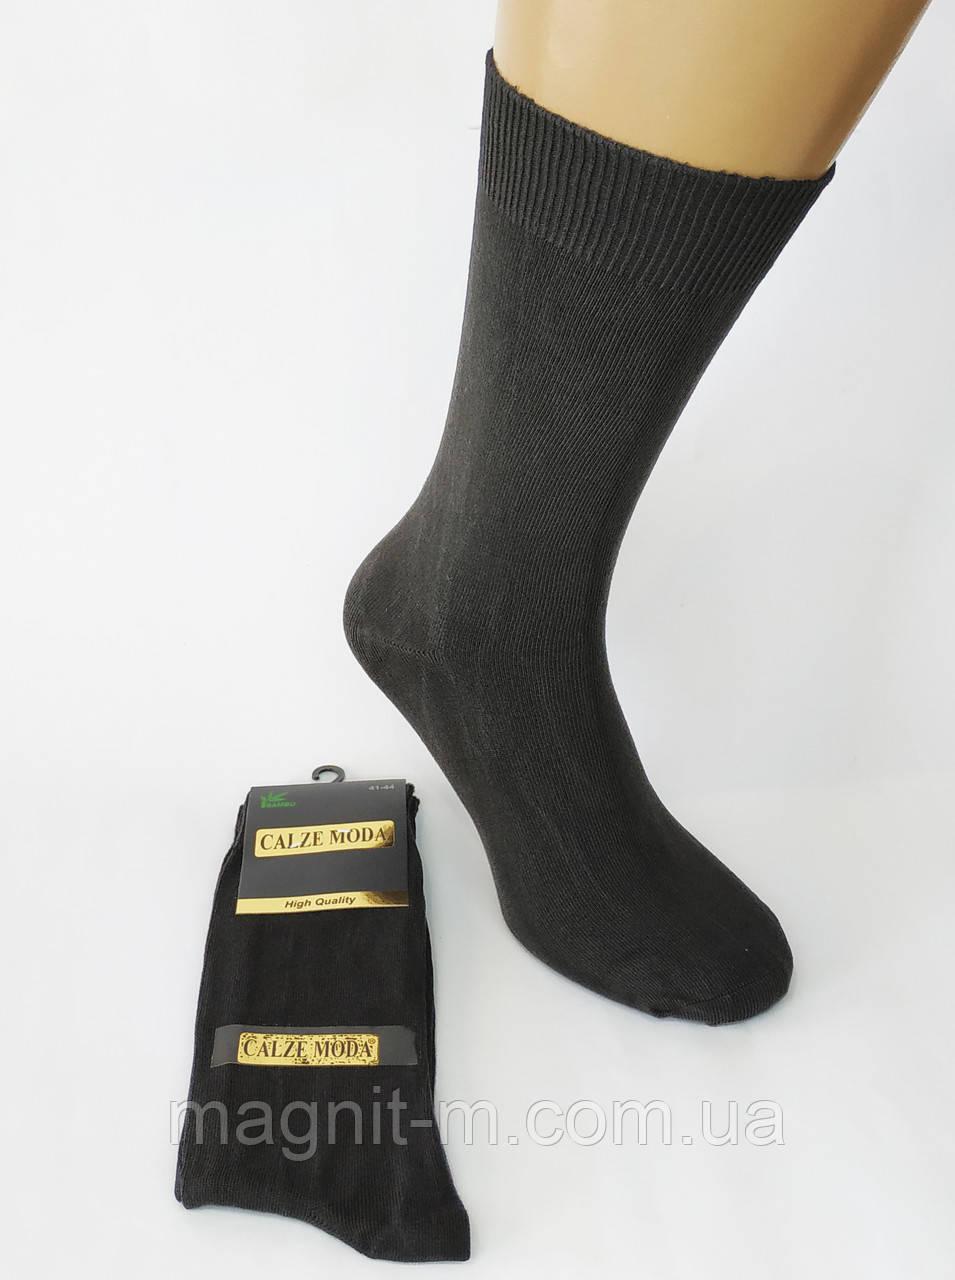 "Шкарпетки преміум класу ""Calze Moda"". Бамбук. Туреччина. Чорні. Р-Р 41-44."